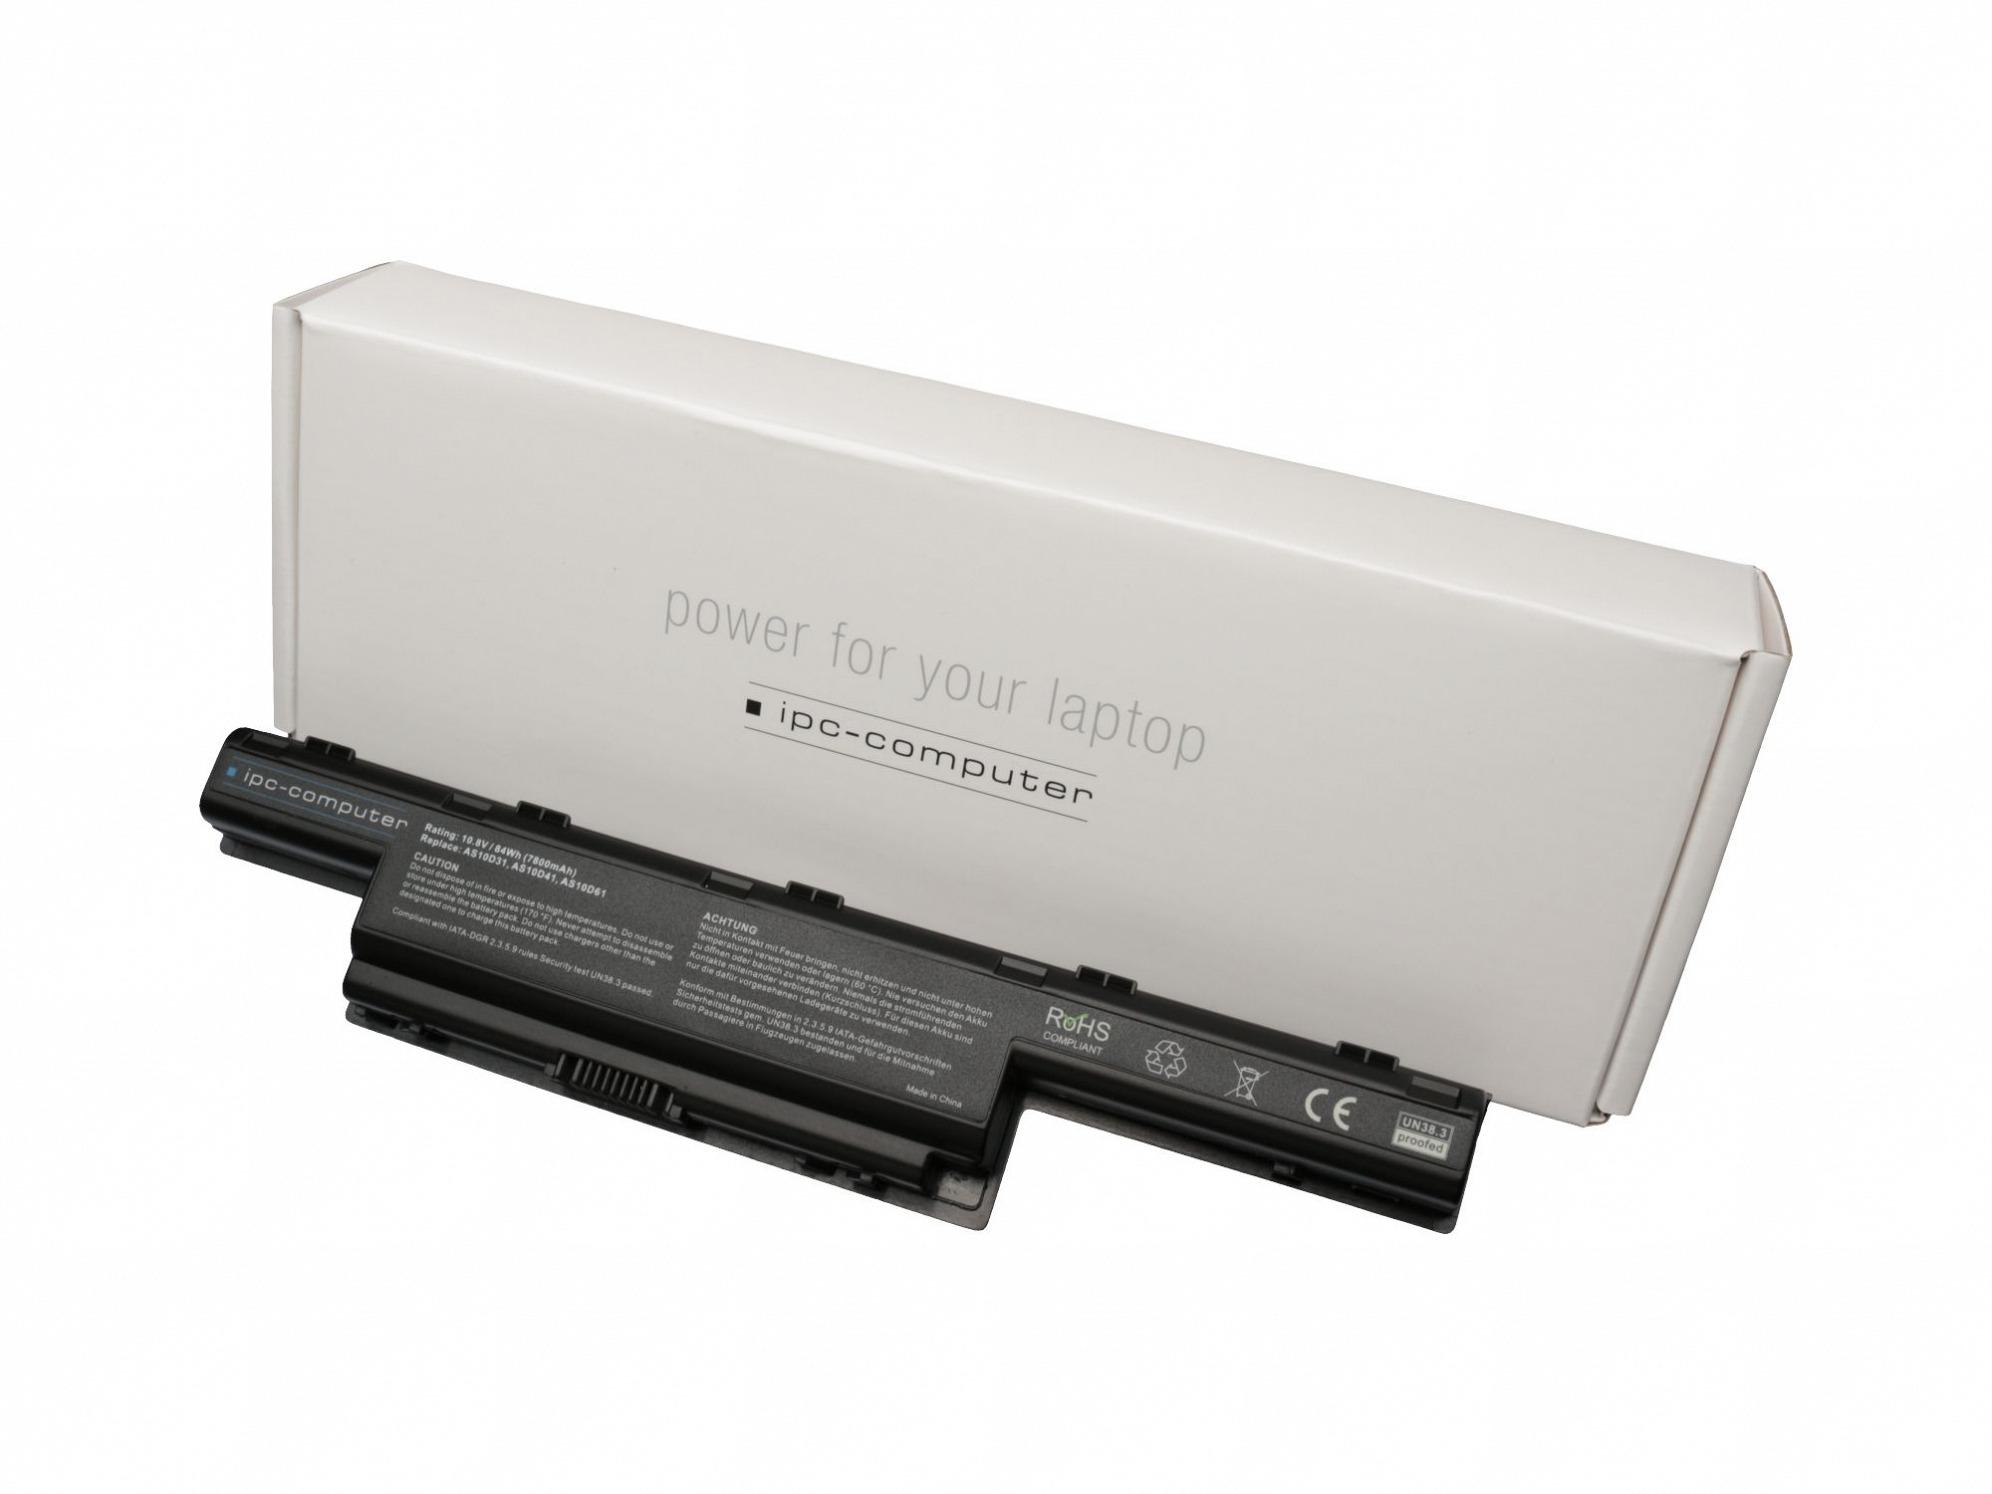 batterie pour ordinateur portable acer aspire 7741g serie. Black Bedroom Furniture Sets. Home Design Ideas